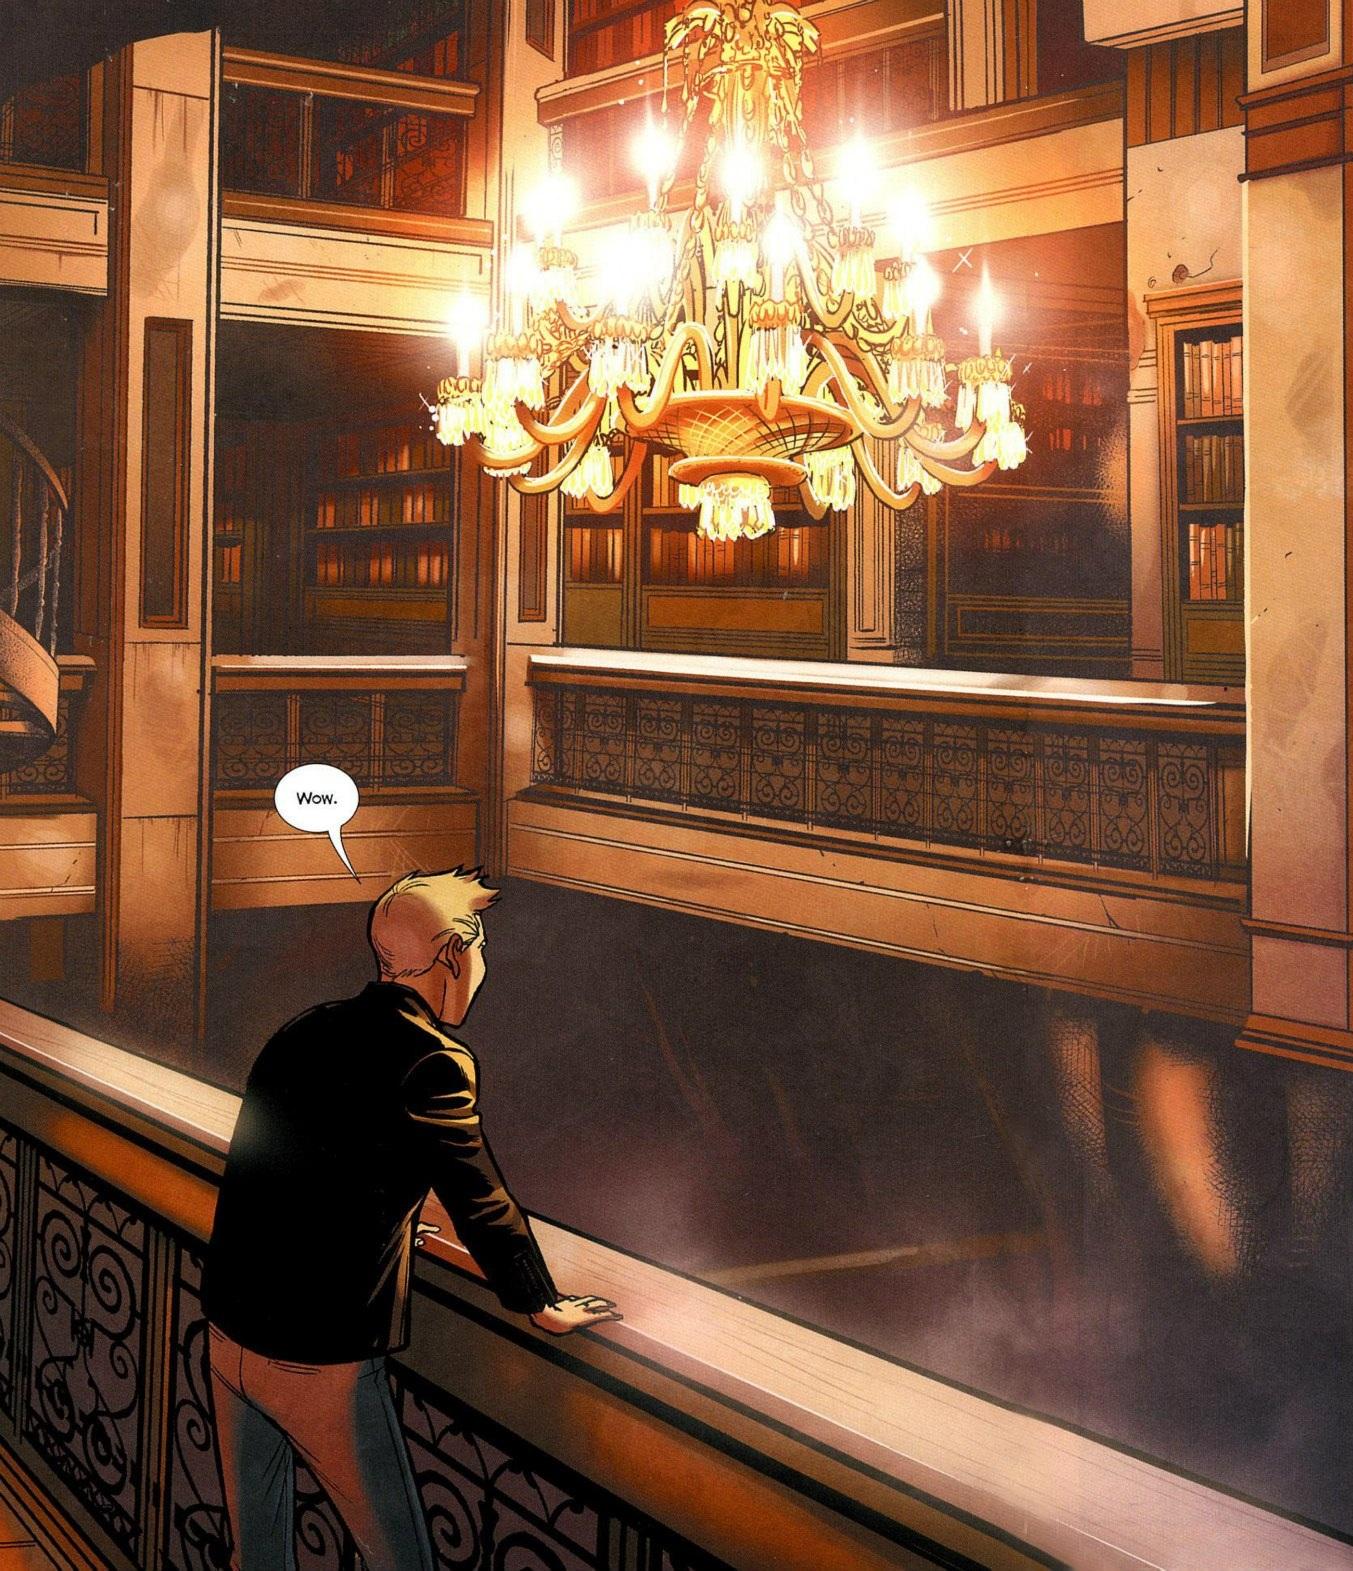 Biblioteca di Ivan il Terribile | Assassin's Creed Wiki ...